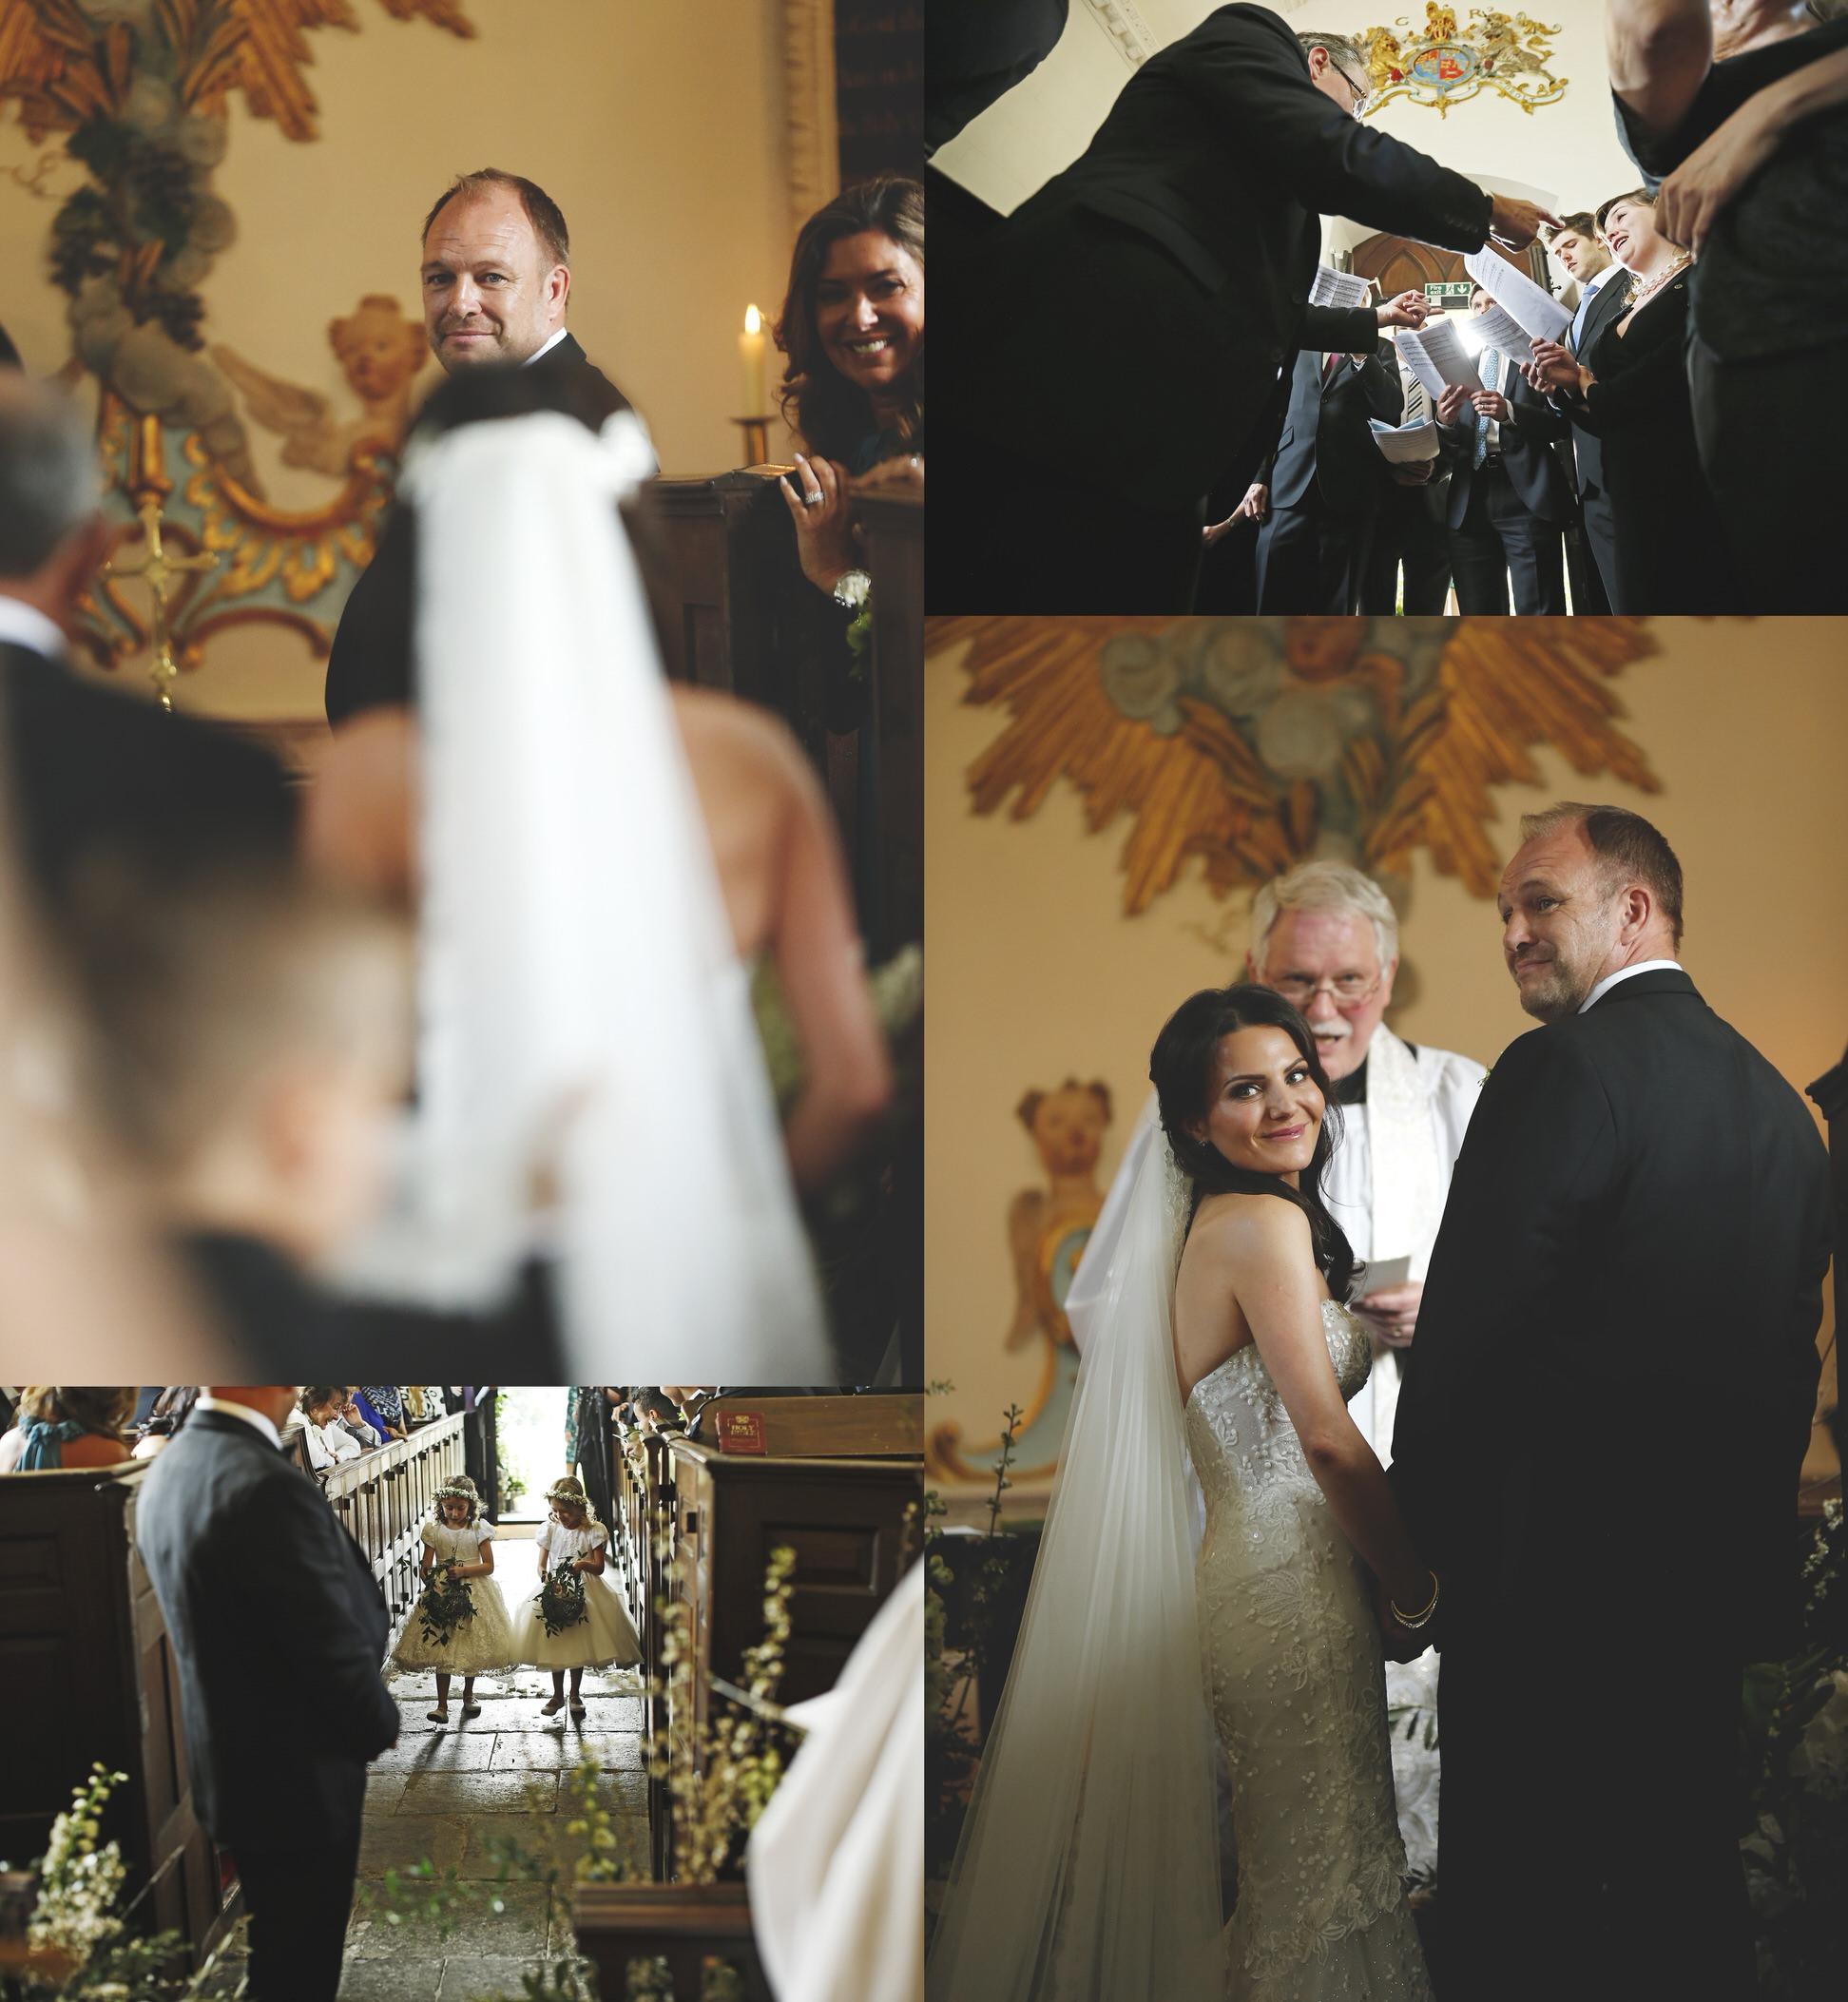 brettharkness-luxury-wedding-photographer-uk_0029.jpg